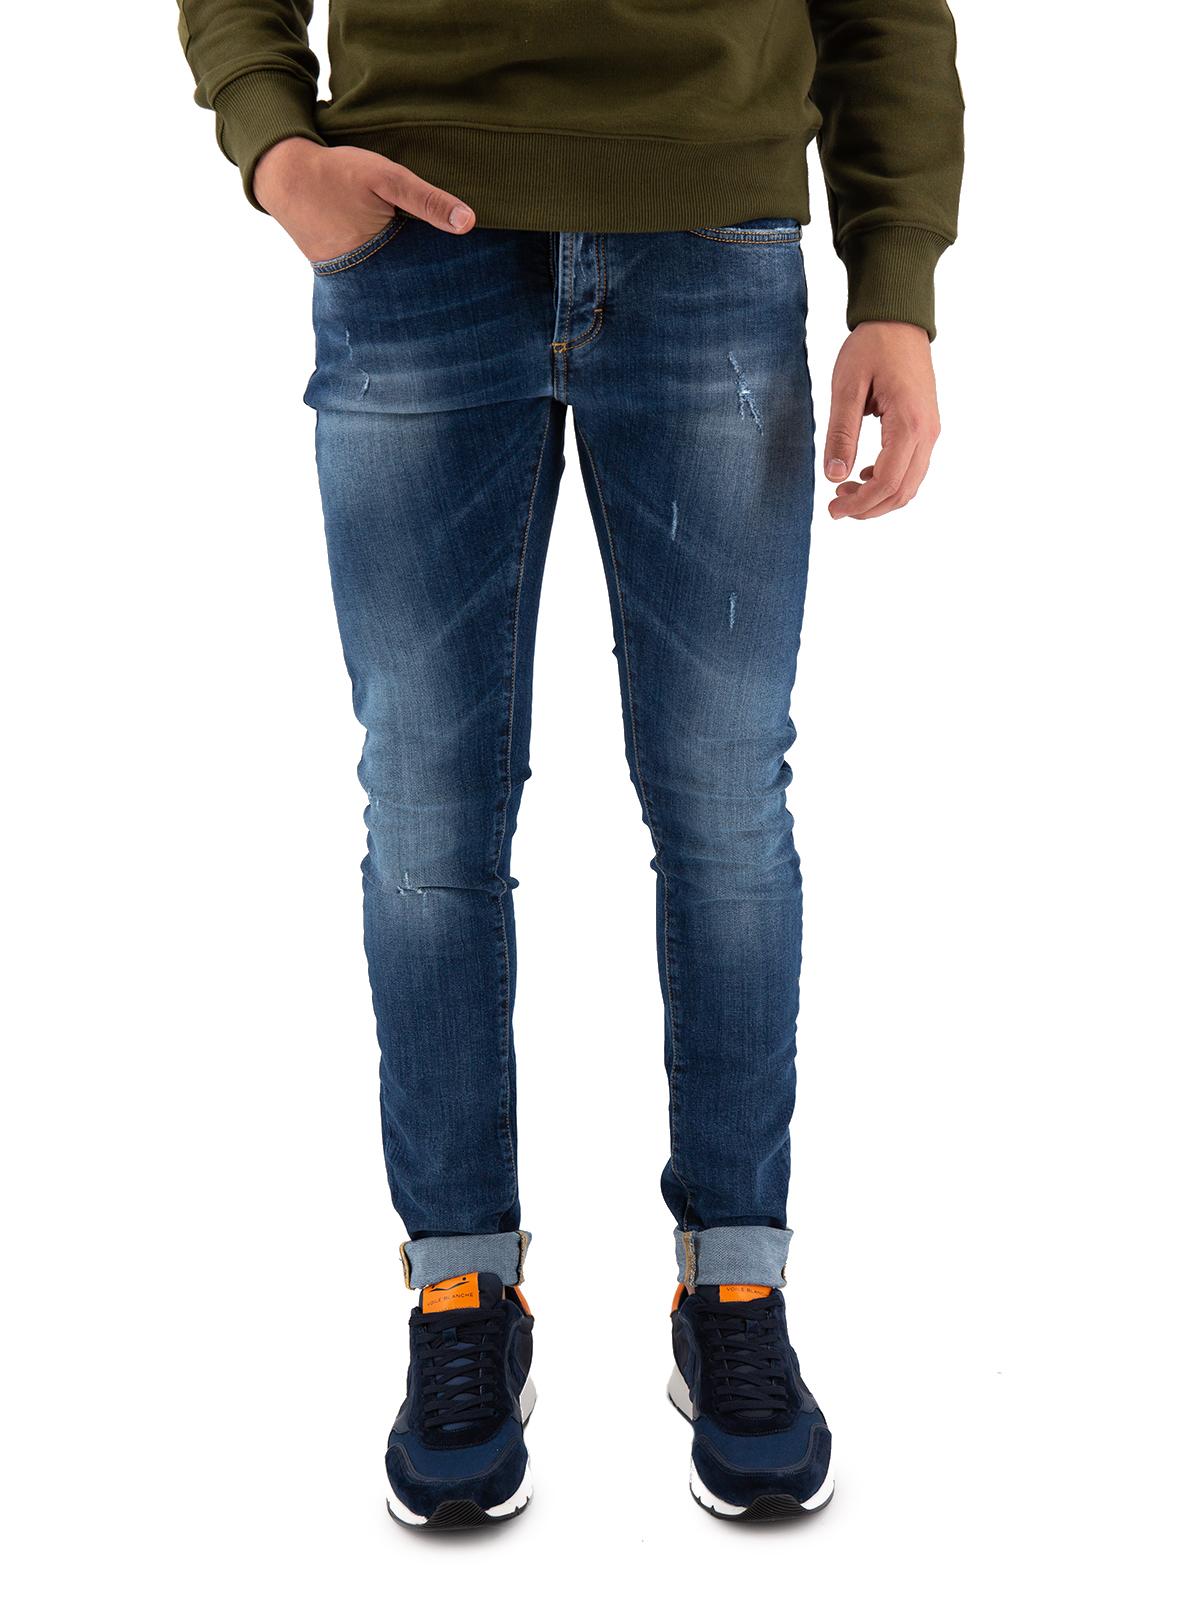 Frankie Morello Jeans FMCF9189JE